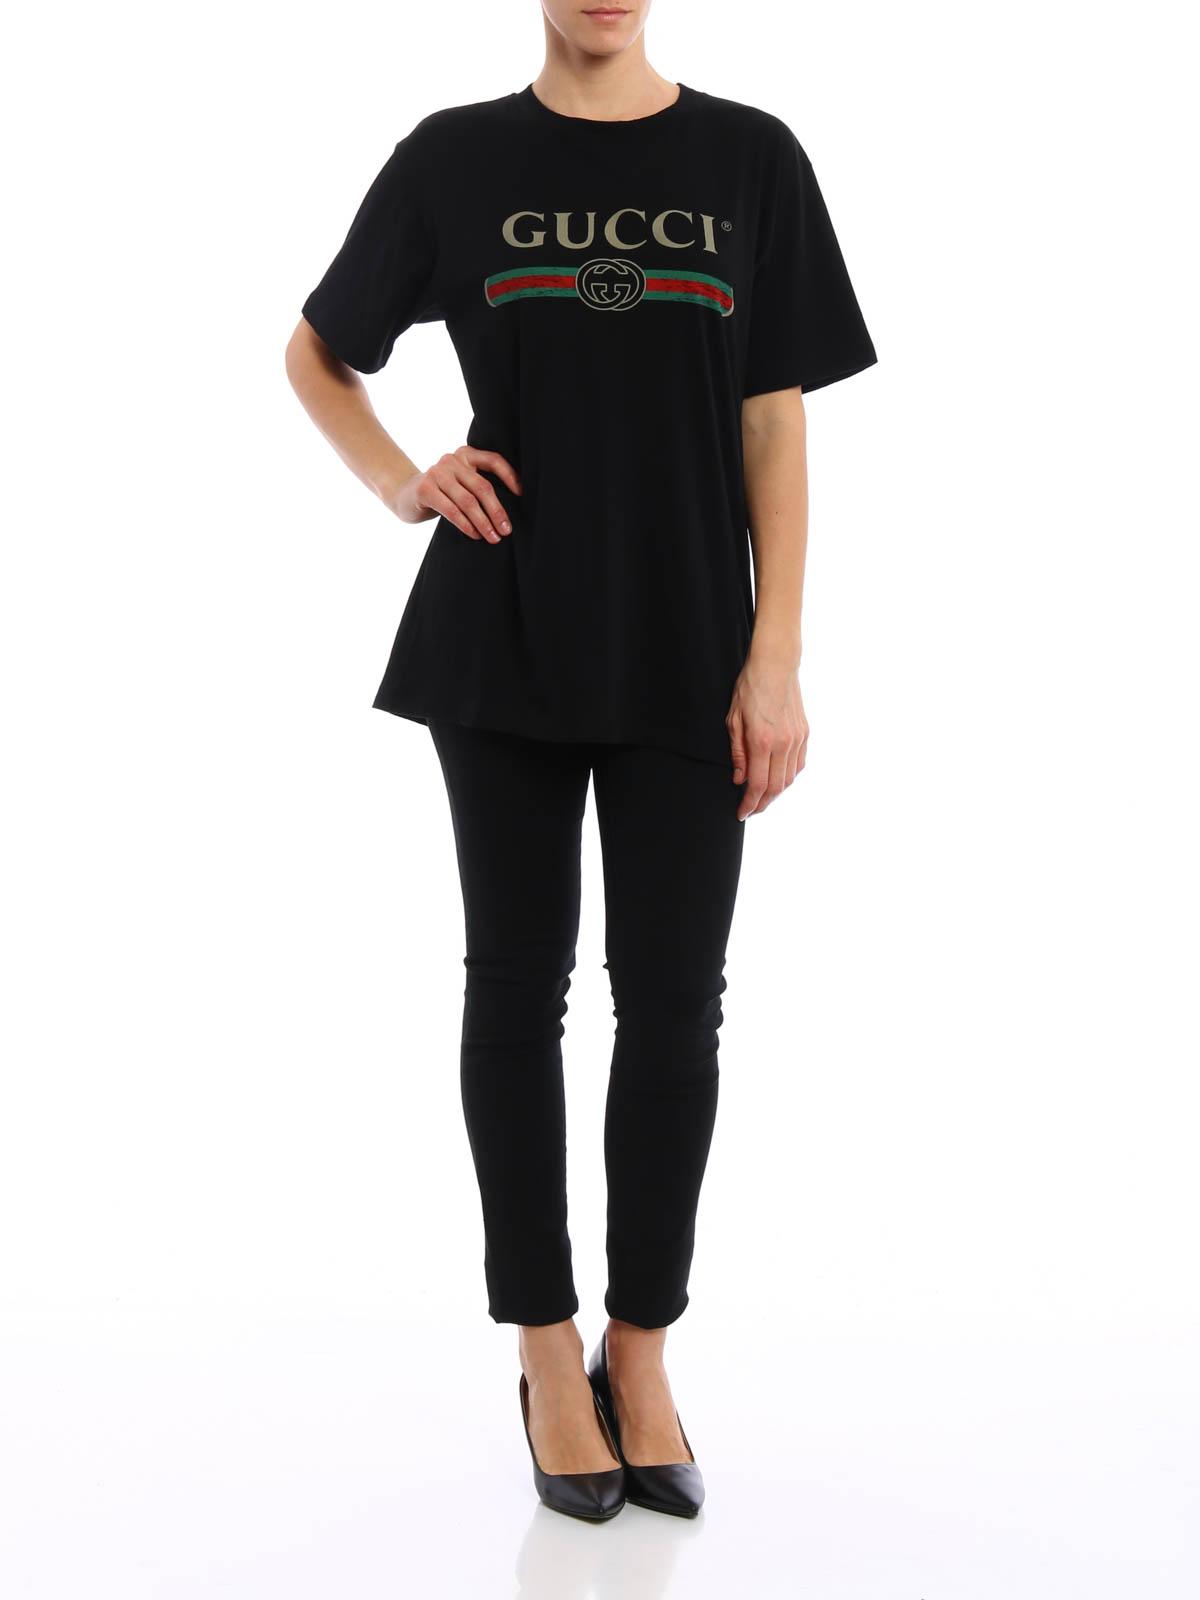 camiseta negra para mujer de gucci camisetas ikrix ikrix. Black Bedroom Furniture Sets. Home Design Ideas